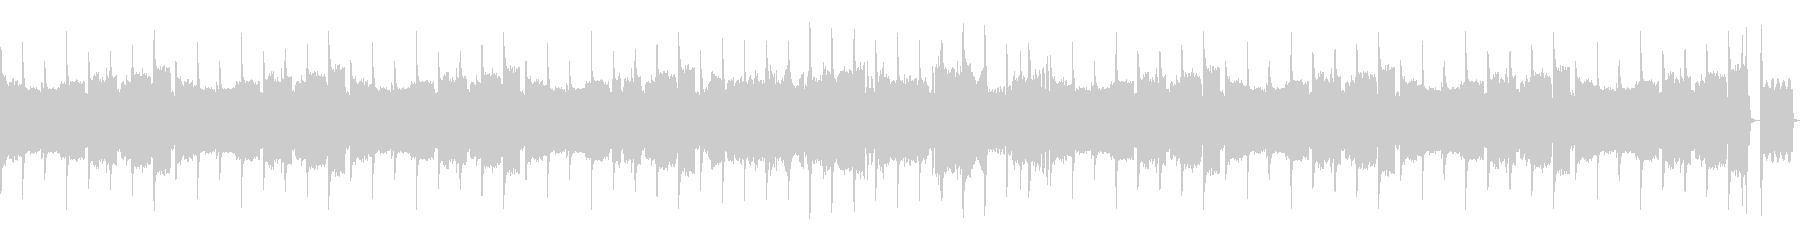 (8bit風、ドラム、ベース抜)の未再生の波形